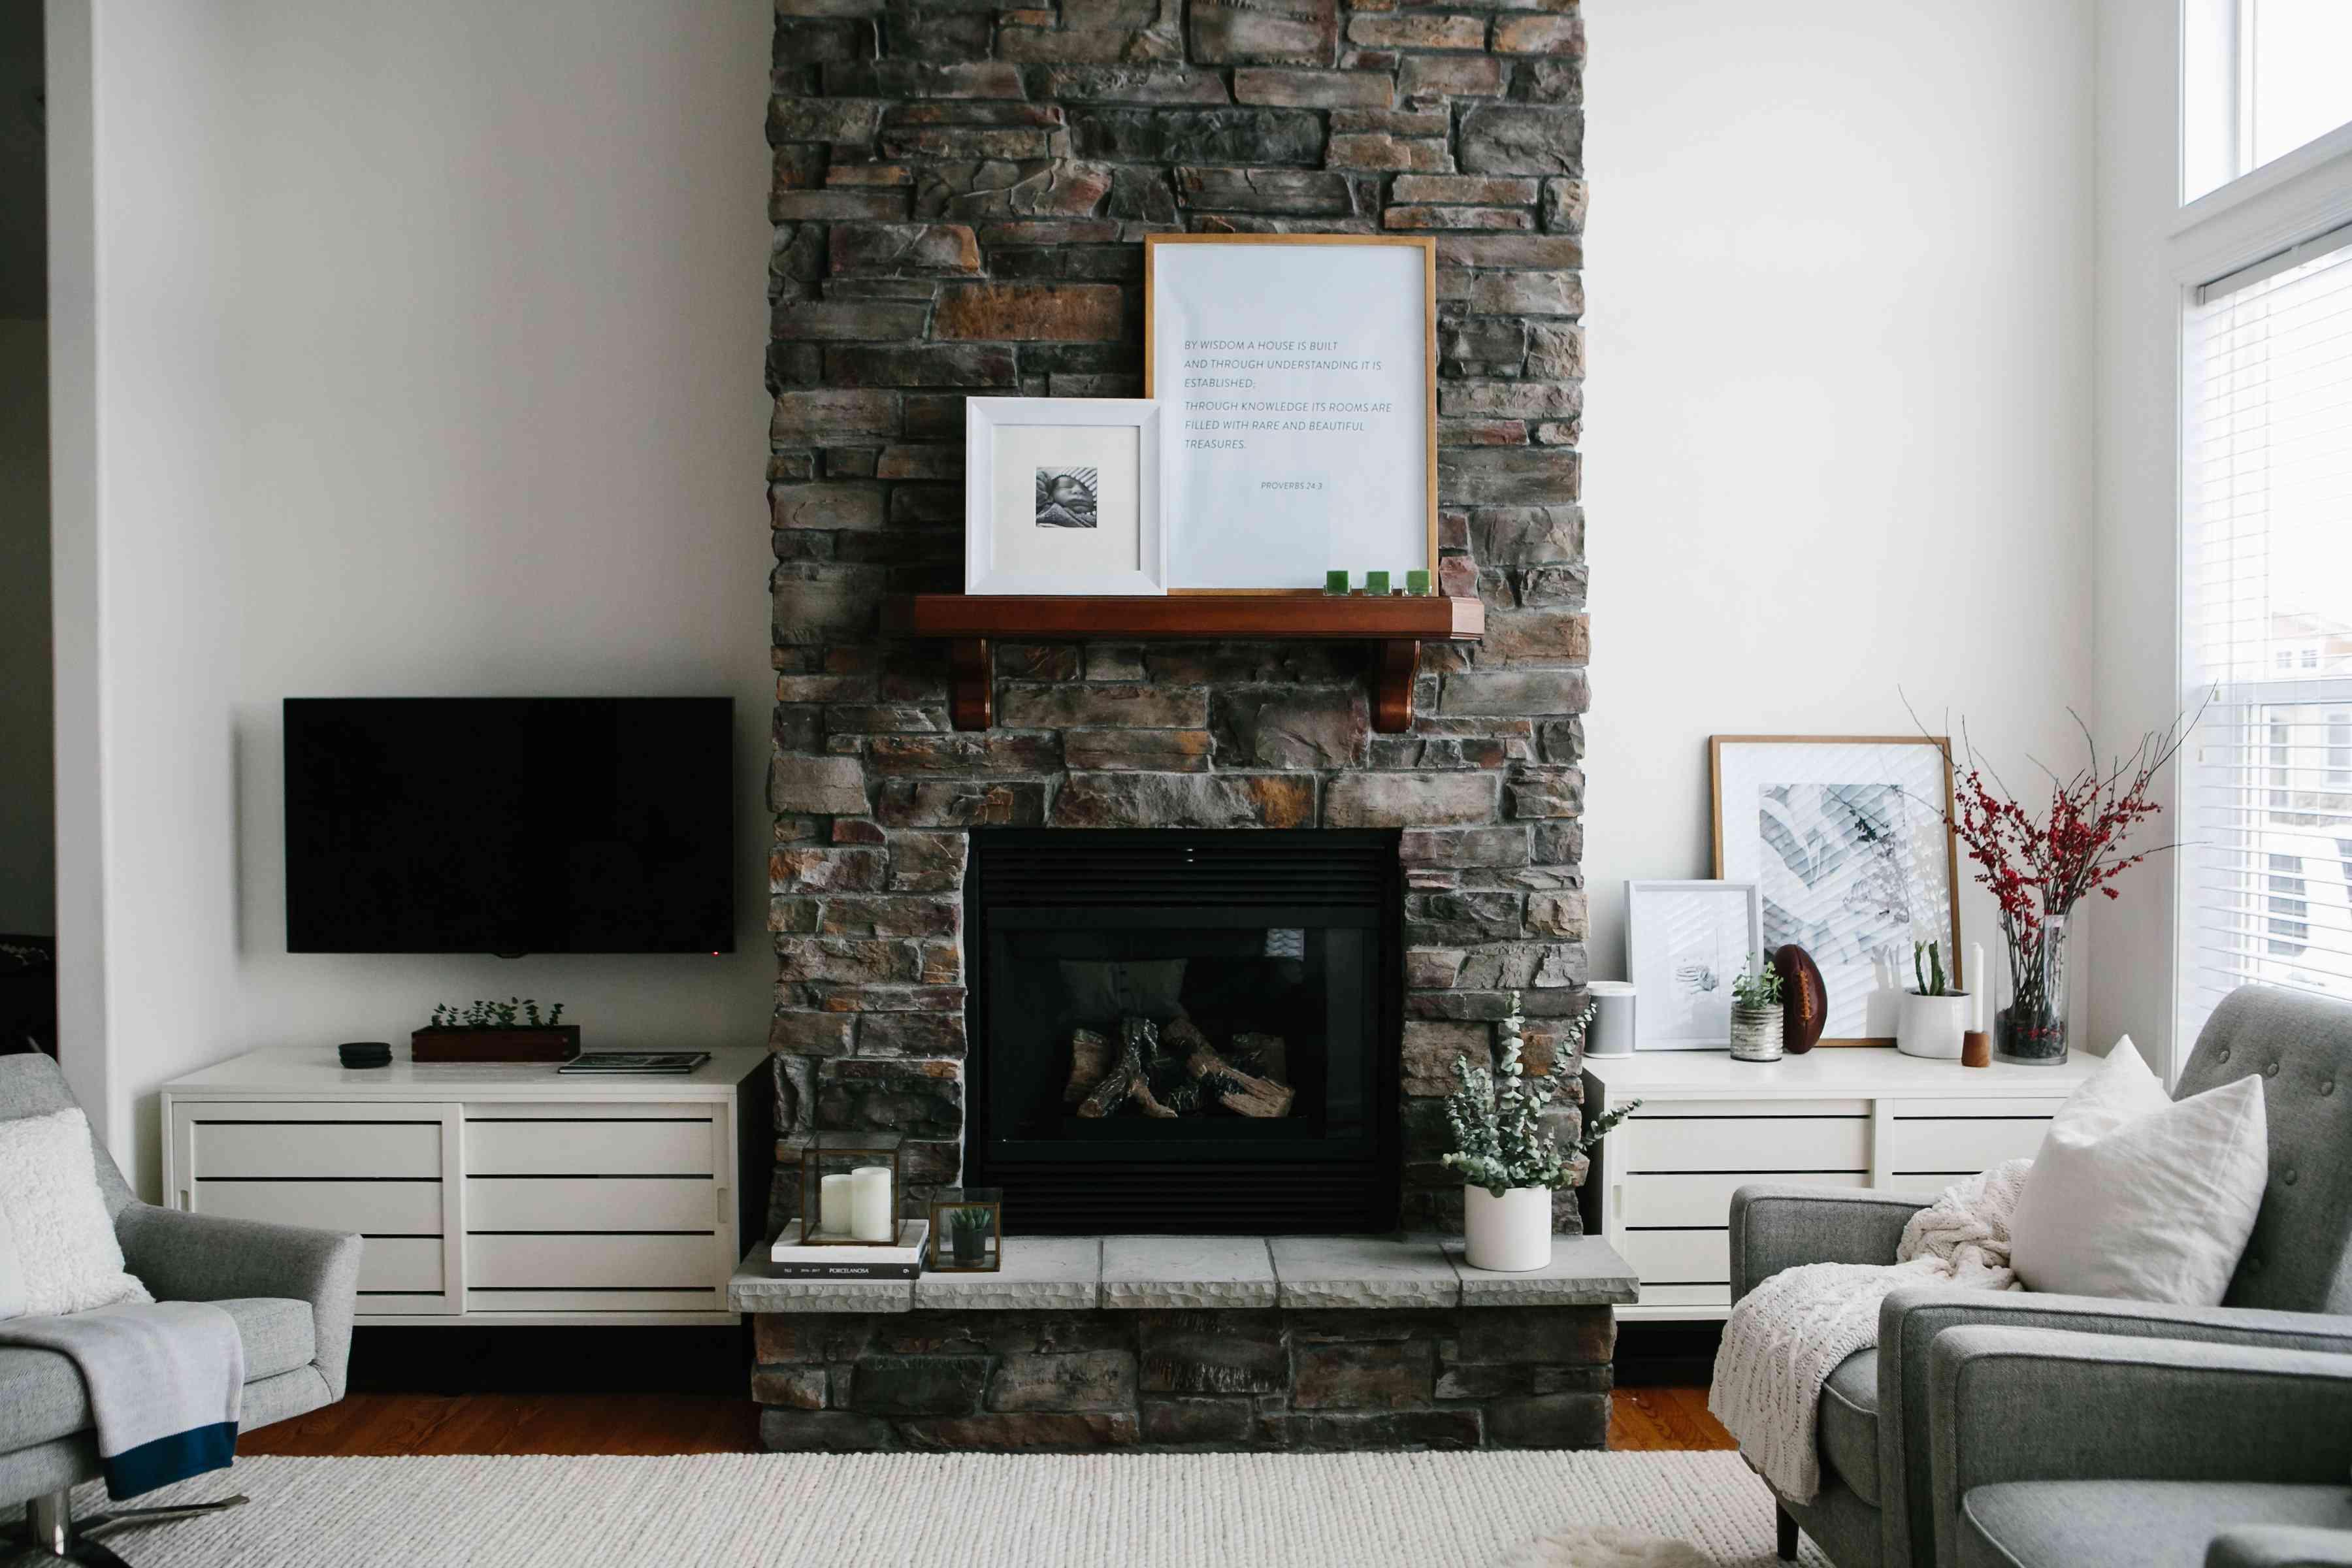 20 Stylish Mantel Ideas for Your Decorating Inspiration